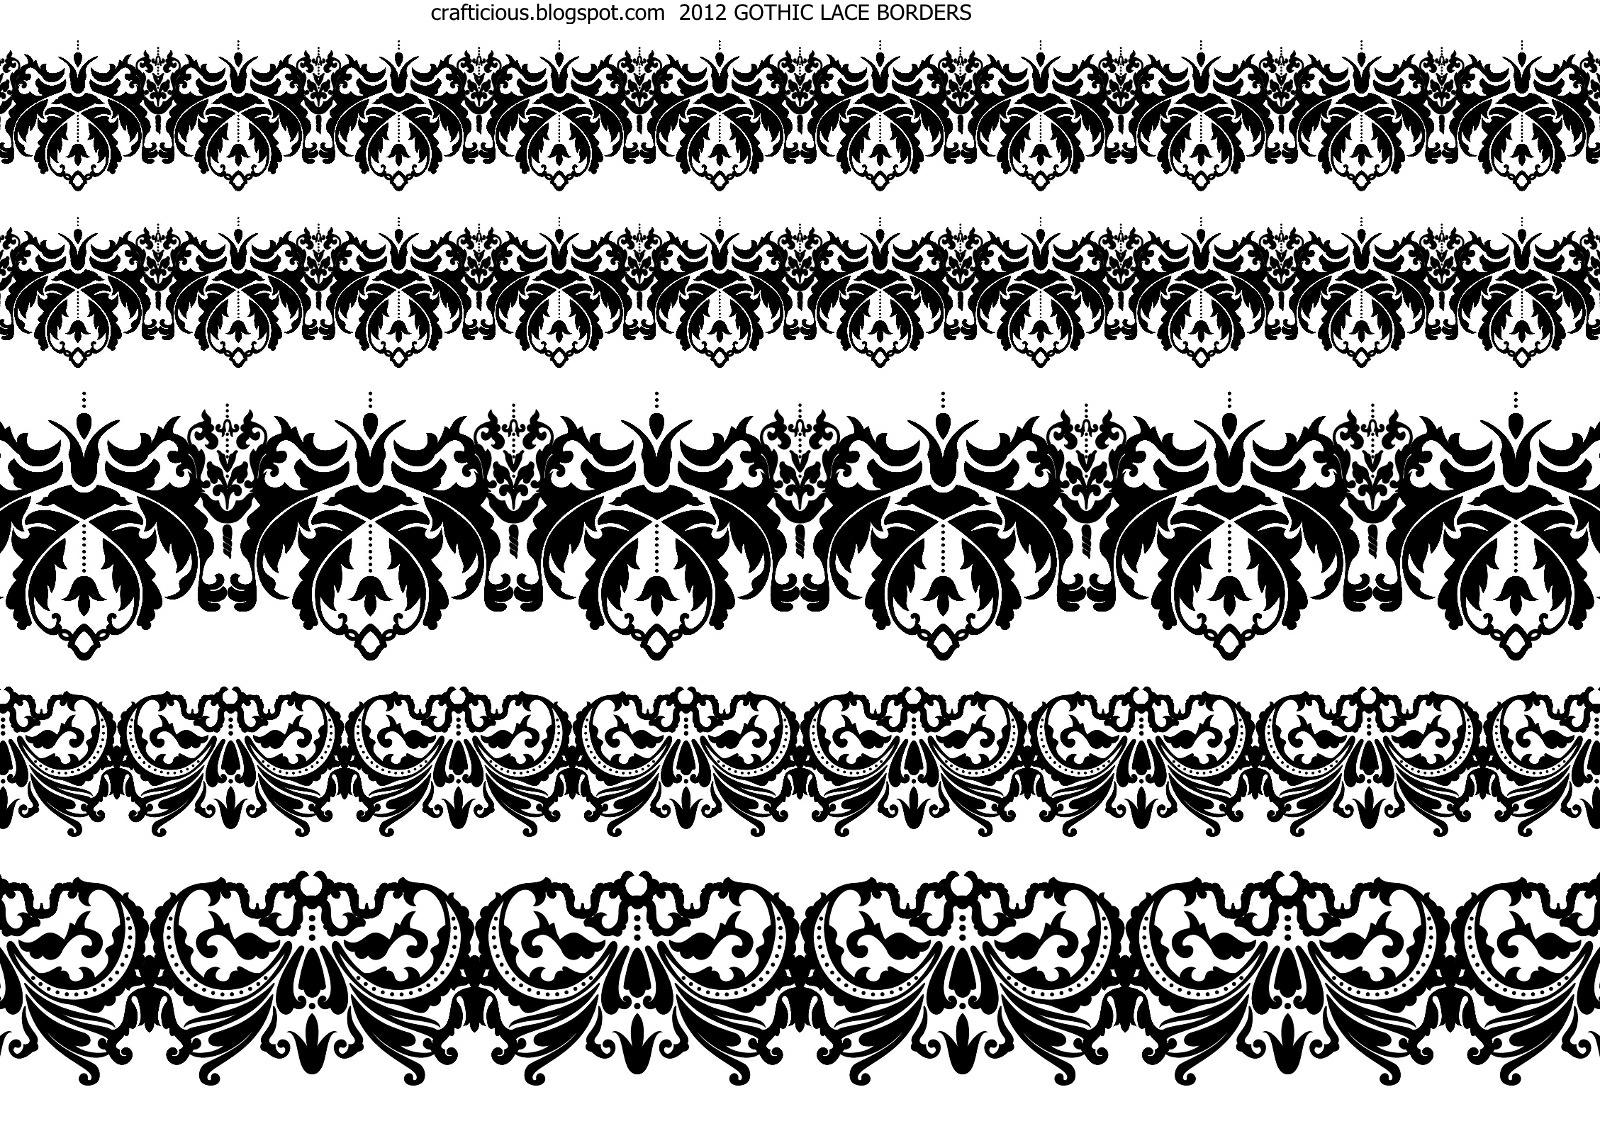 crafticious: Digital Lace Borders & Bats